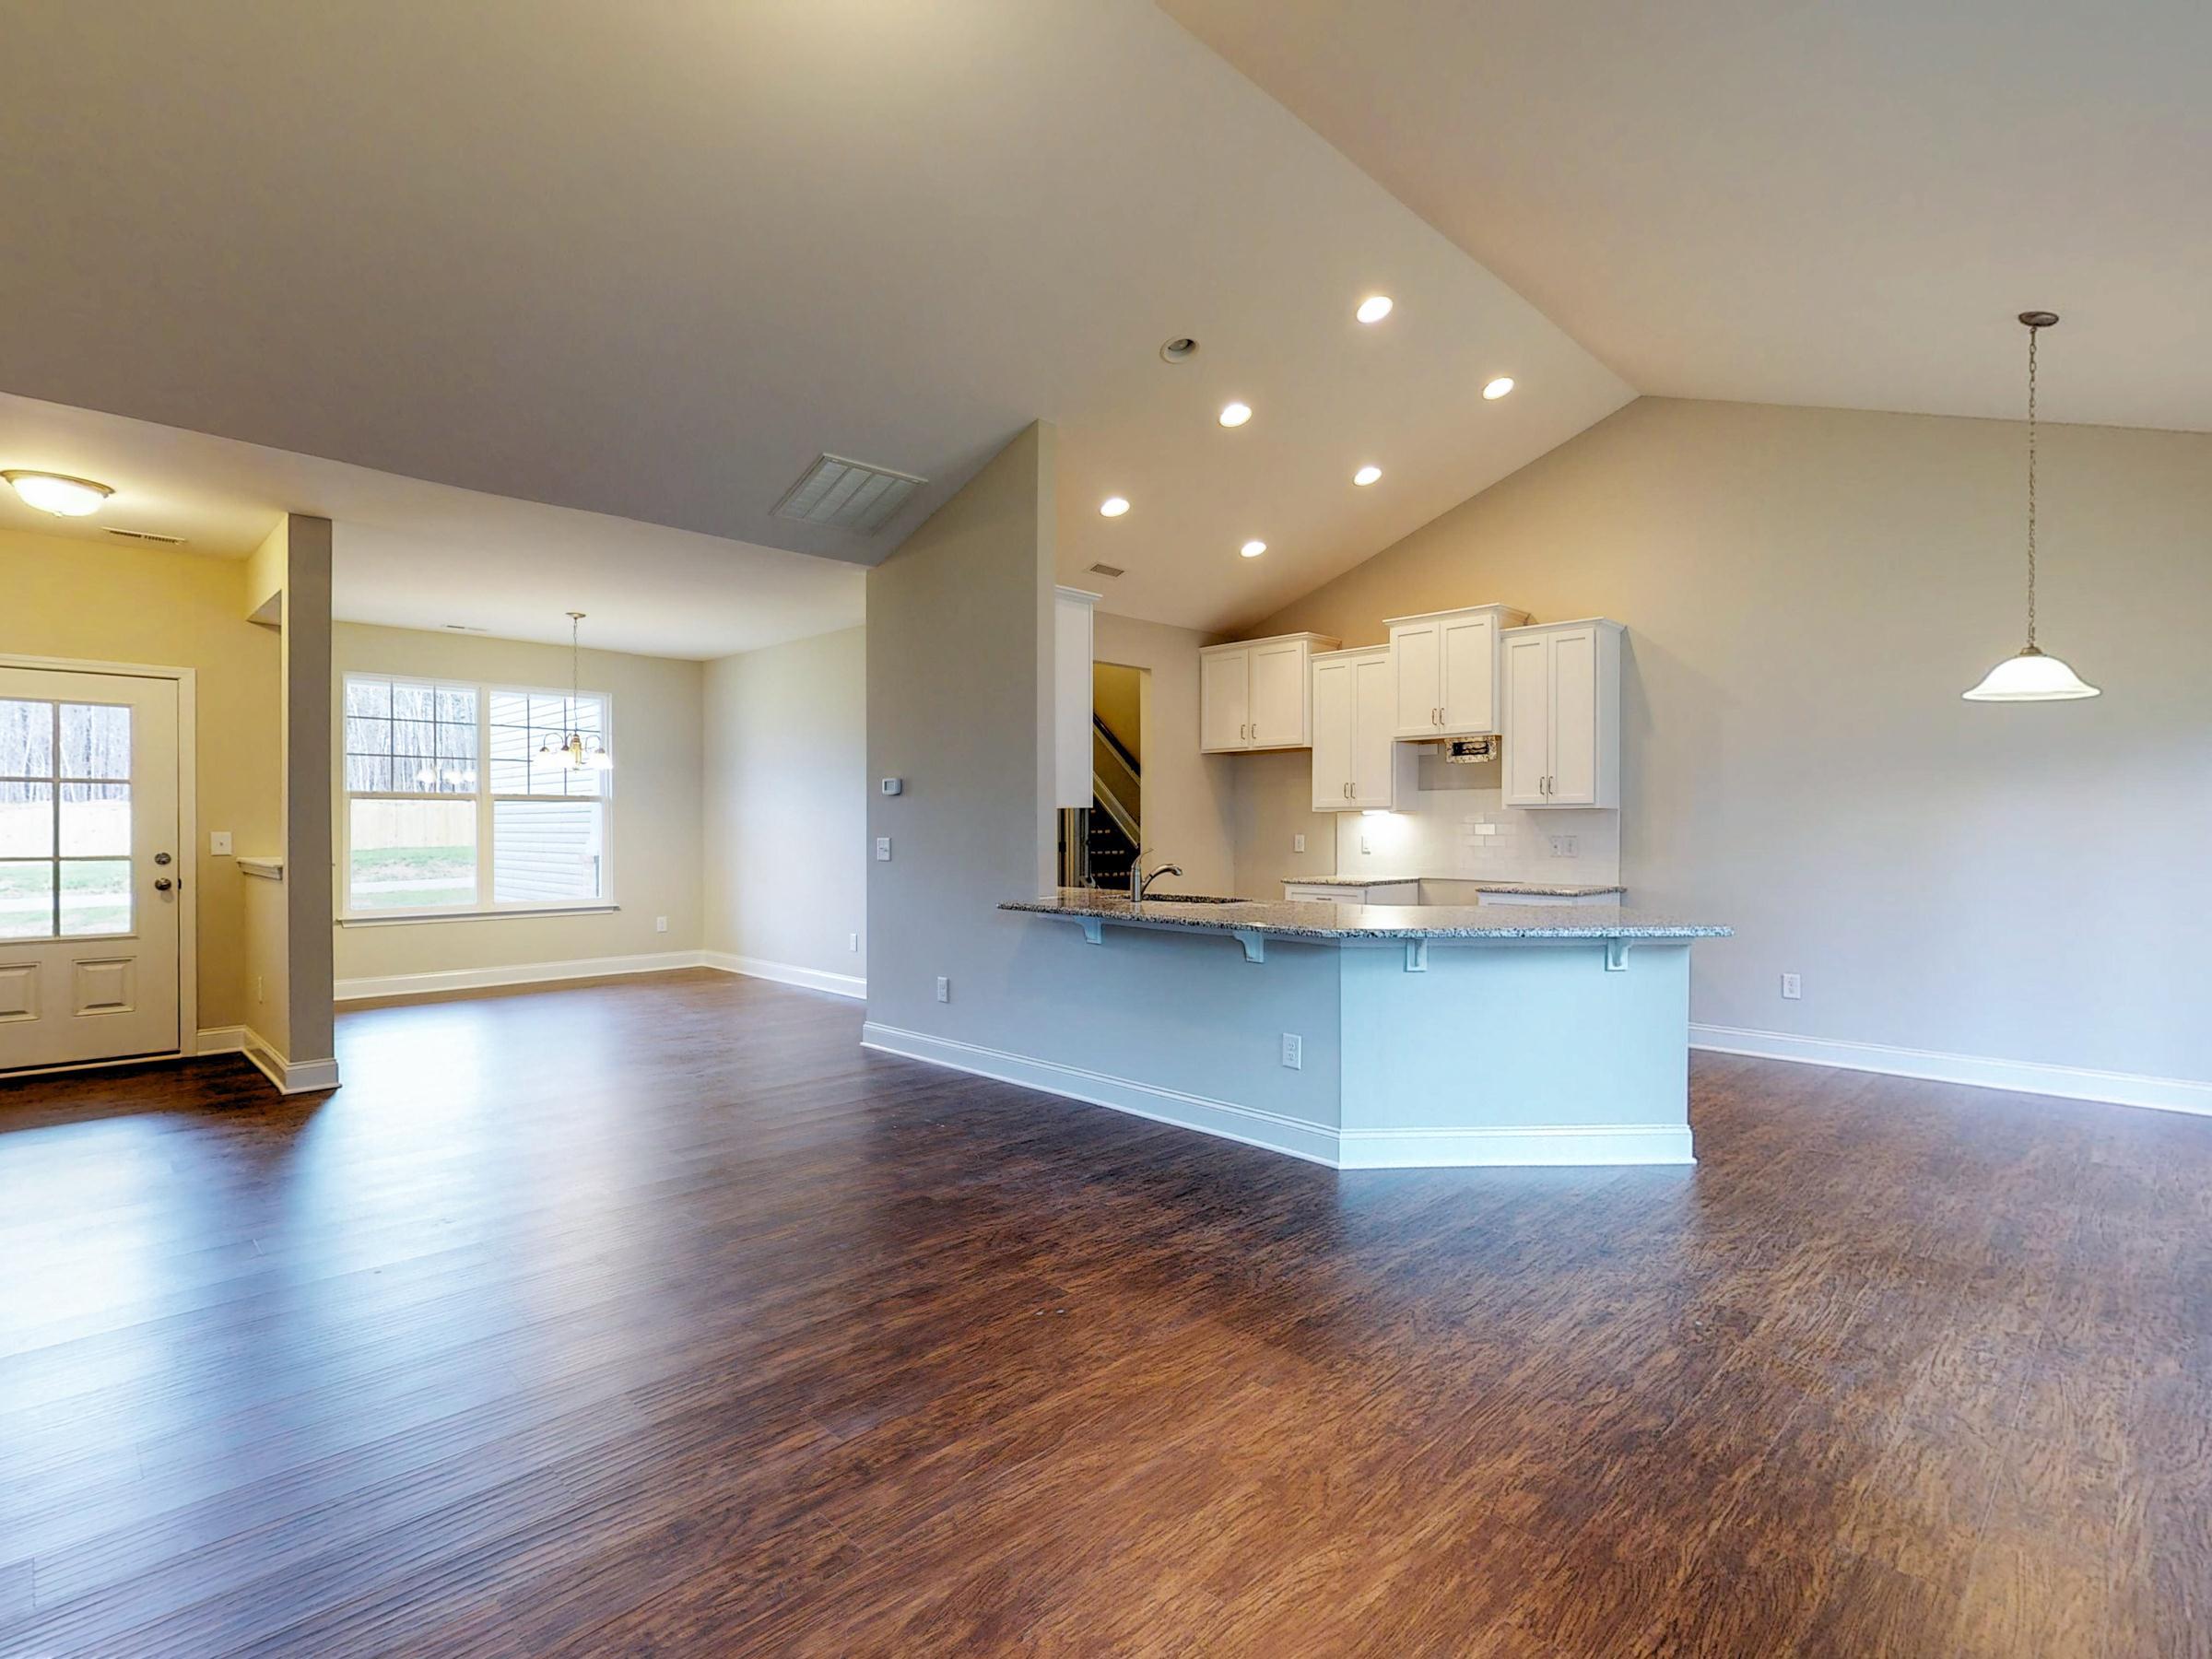 'Summerfield Ridge' by Windsor Homes-Triad in Greensboro-Winston-Salem-High Point